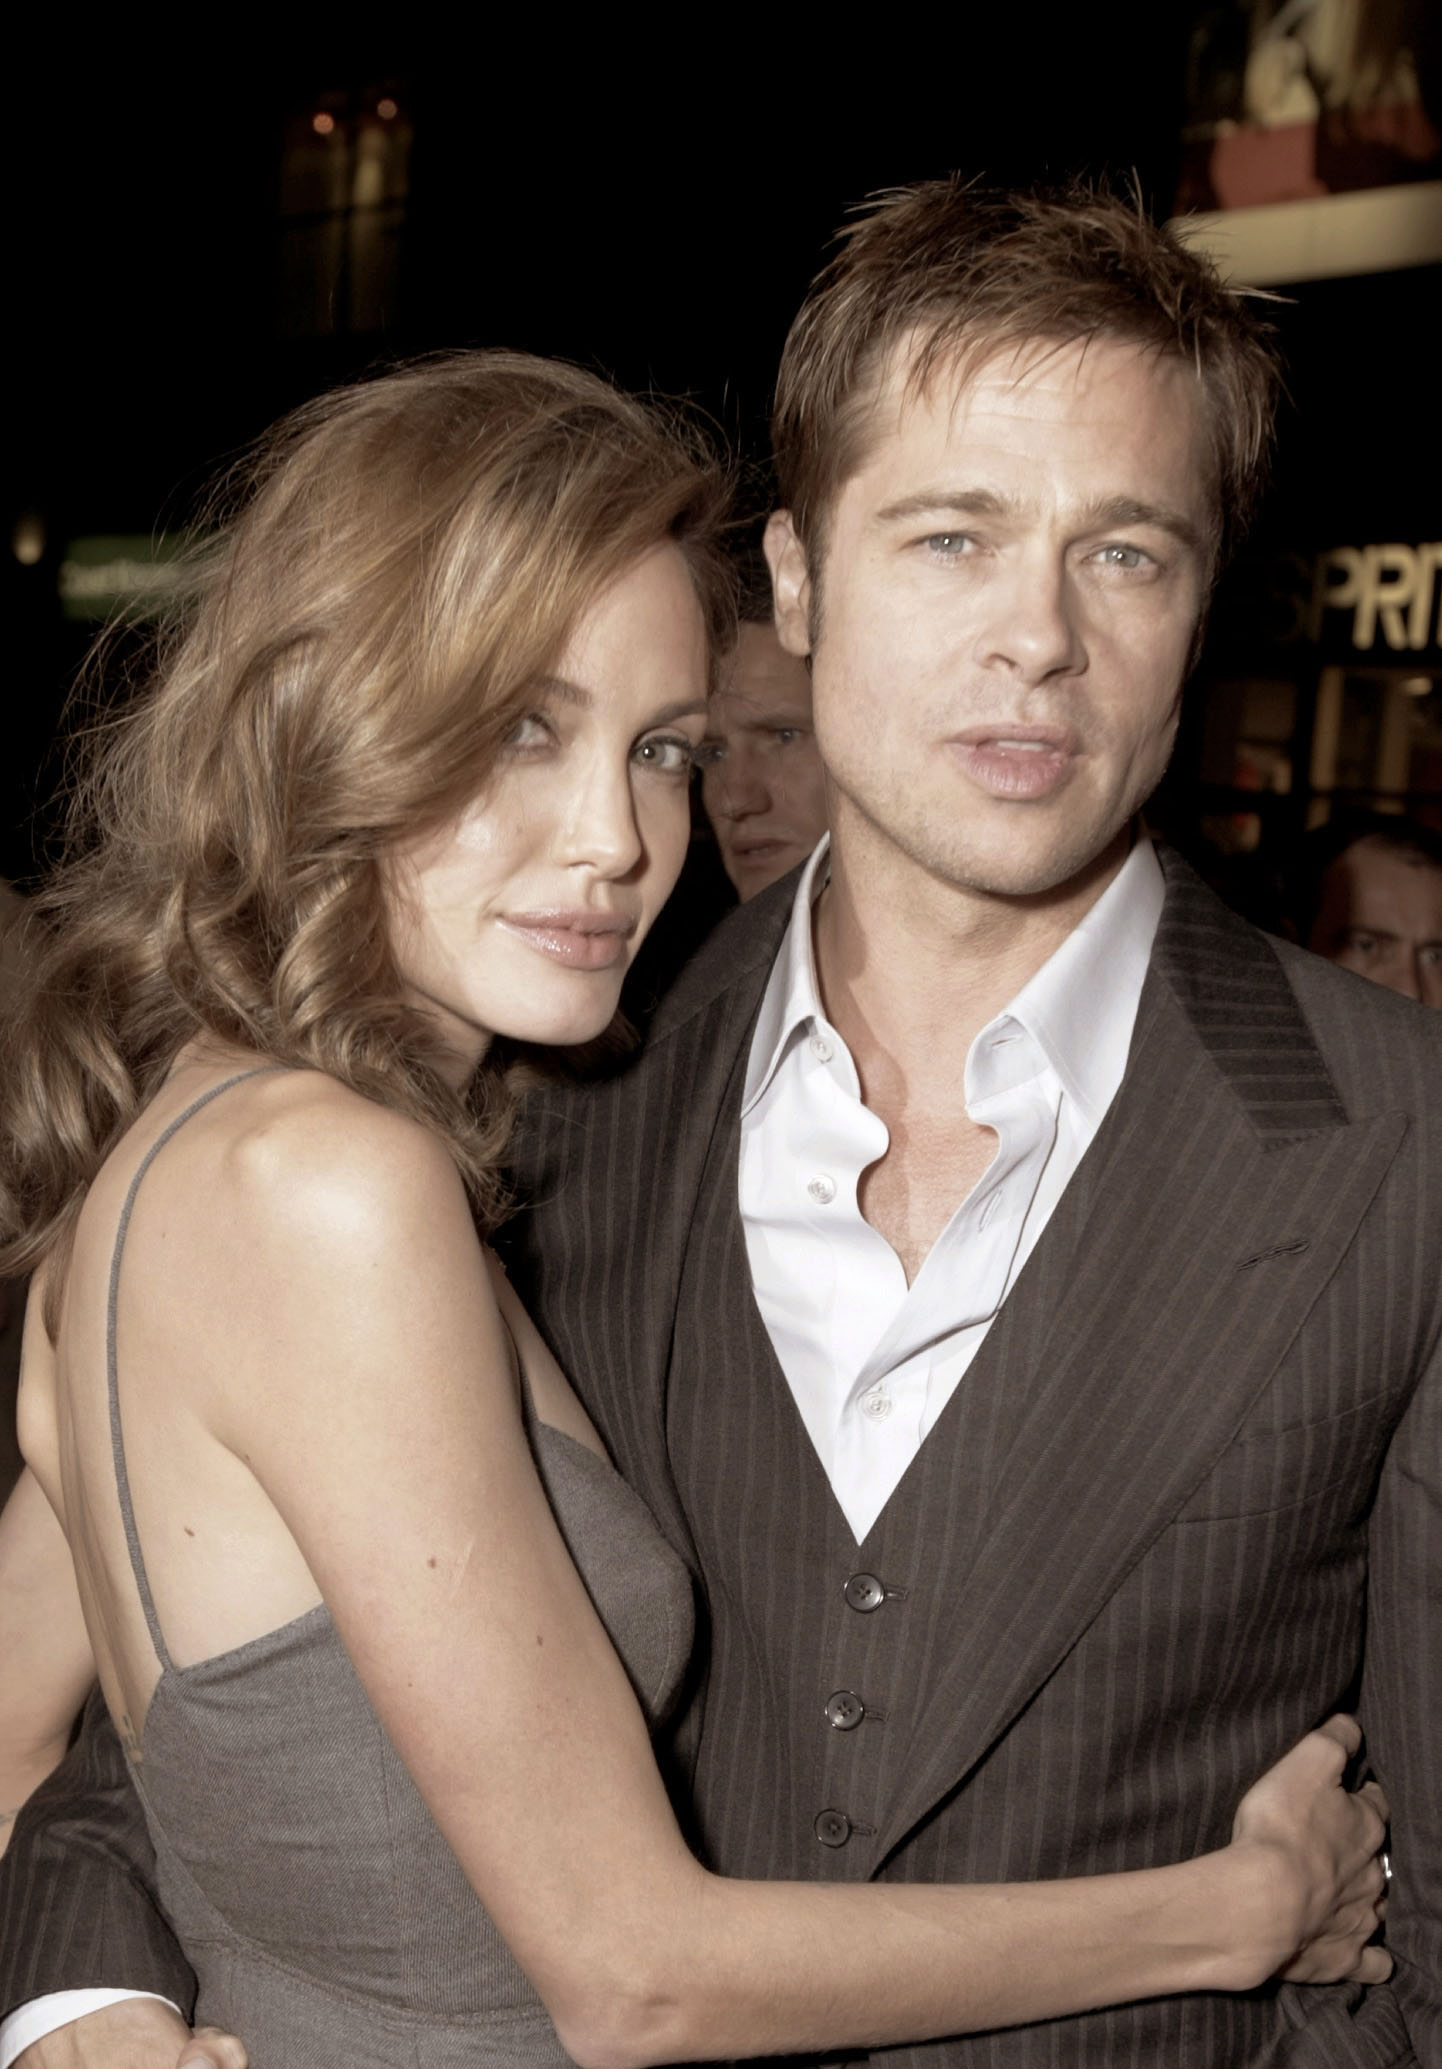 Brad Pitt premiered The Assassination of Jesse James at the 2007 Toronto International Film Festival.